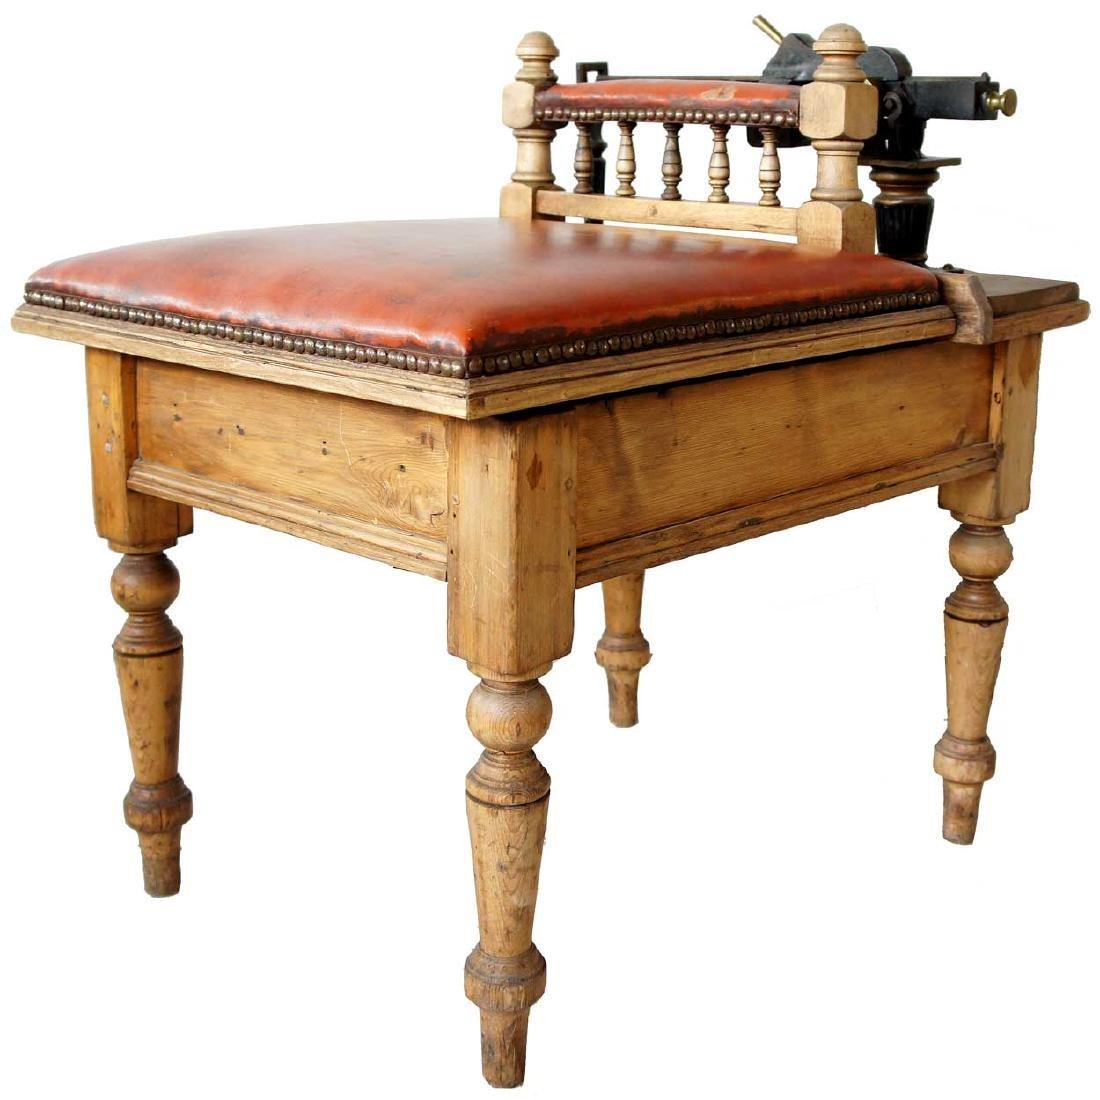 Rare English Pine and Leather Jockey Scale Stool